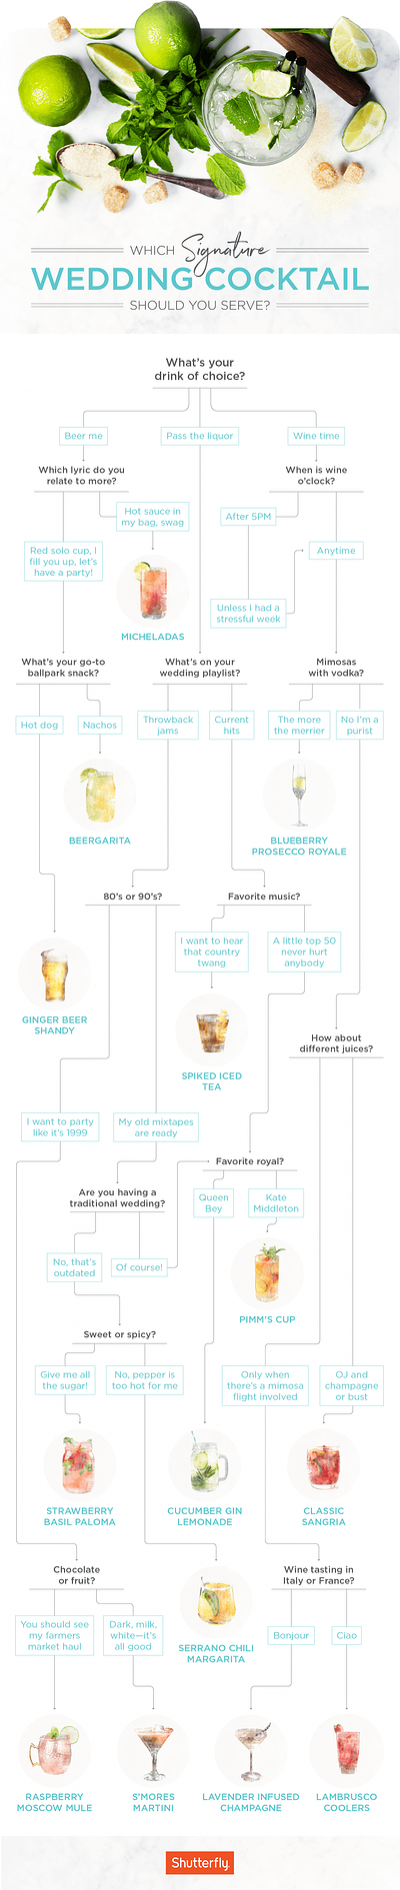 Signature Wedding Cocktails Ideas Flowchart